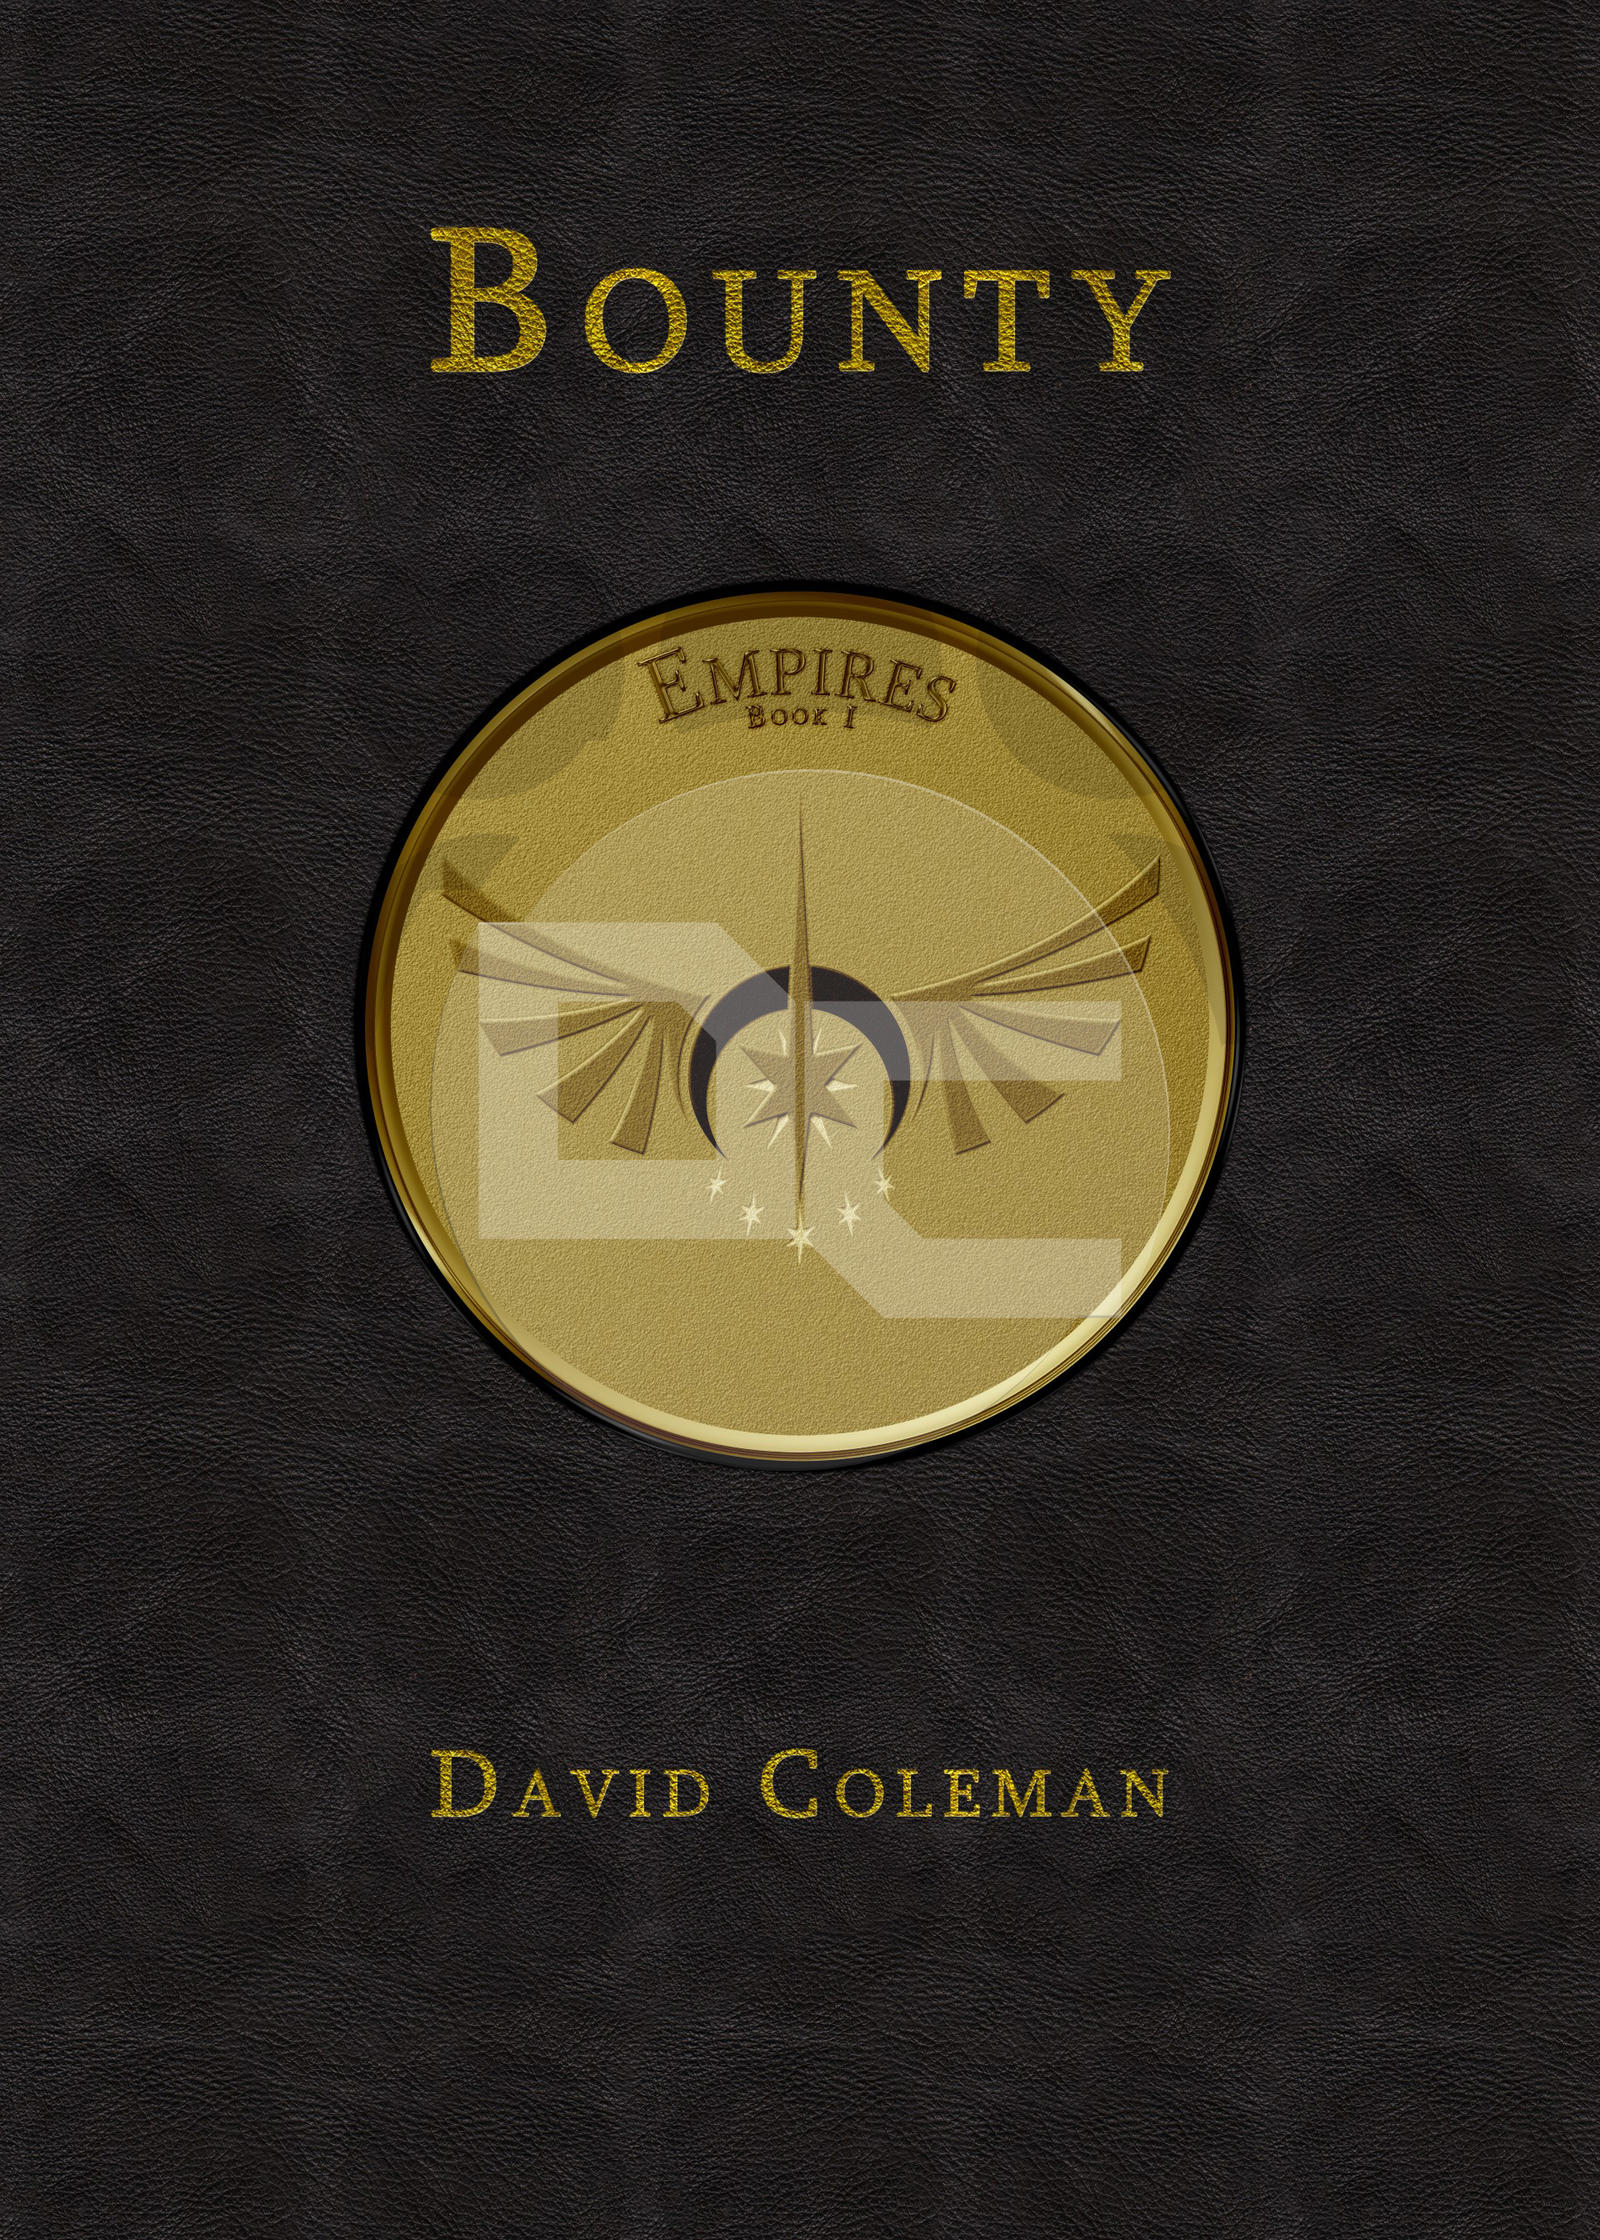 Bounty Book Cover